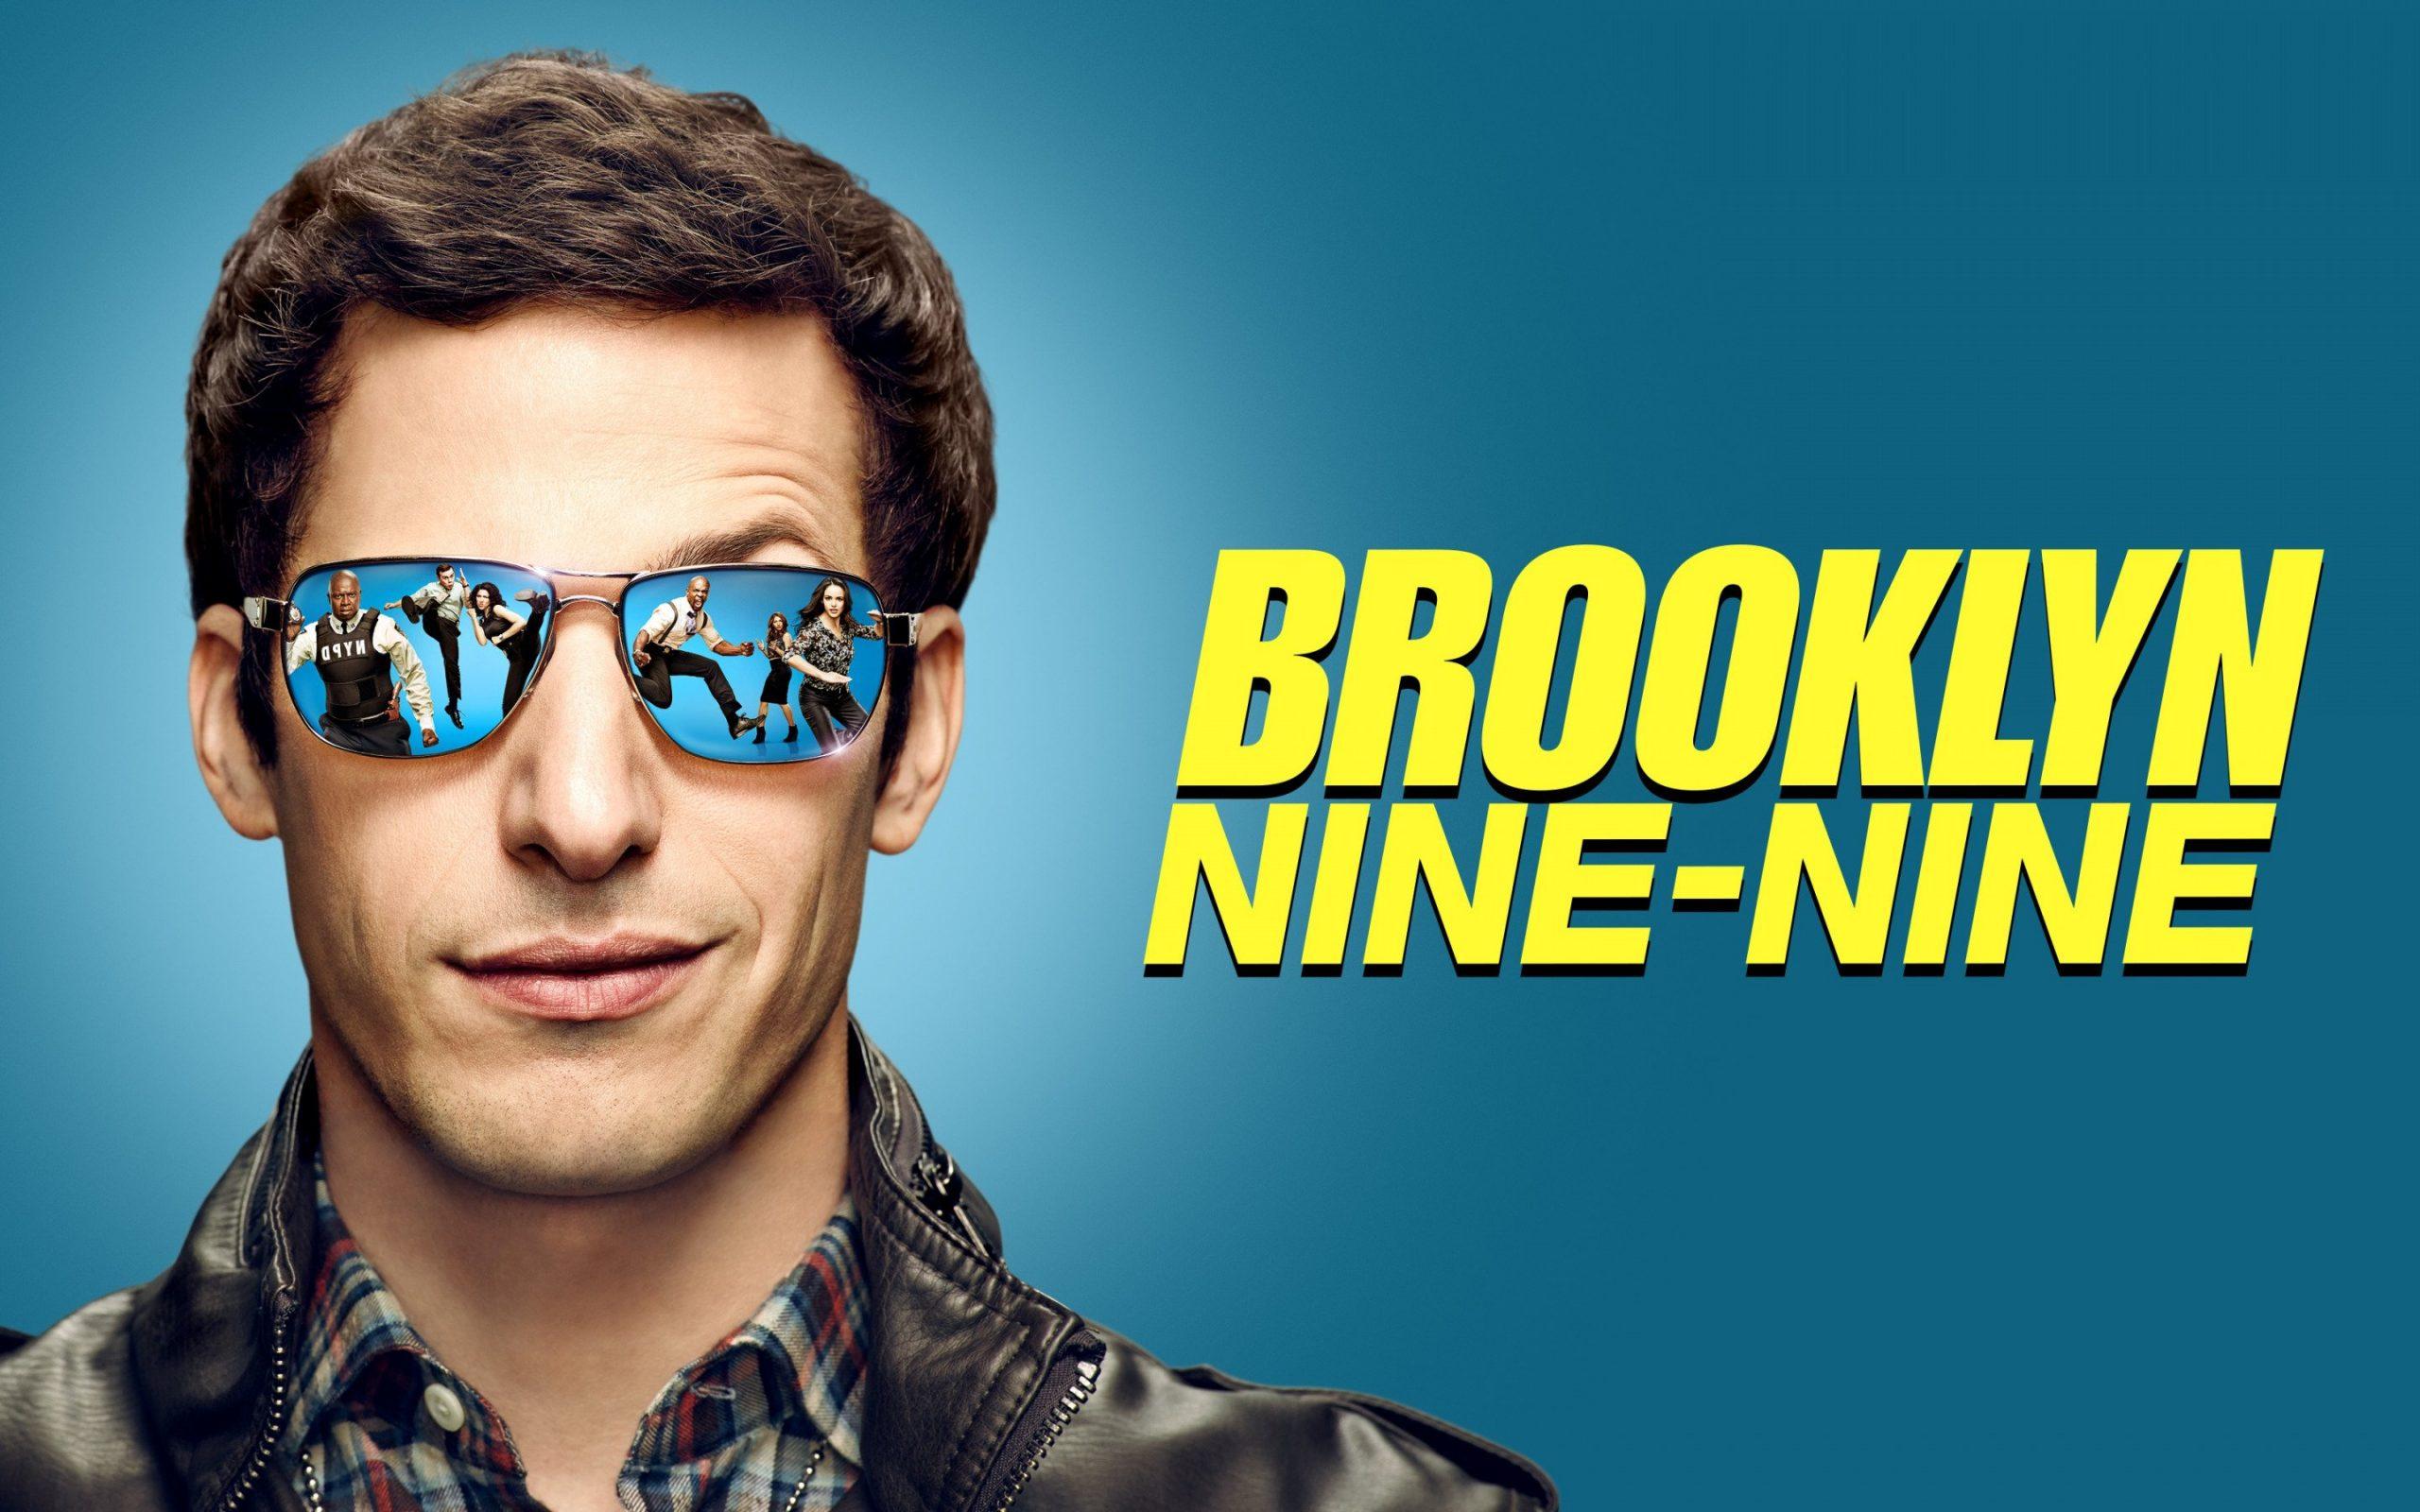 When Will Brooklyn 9-9 Season 8 Premiere On NBC?